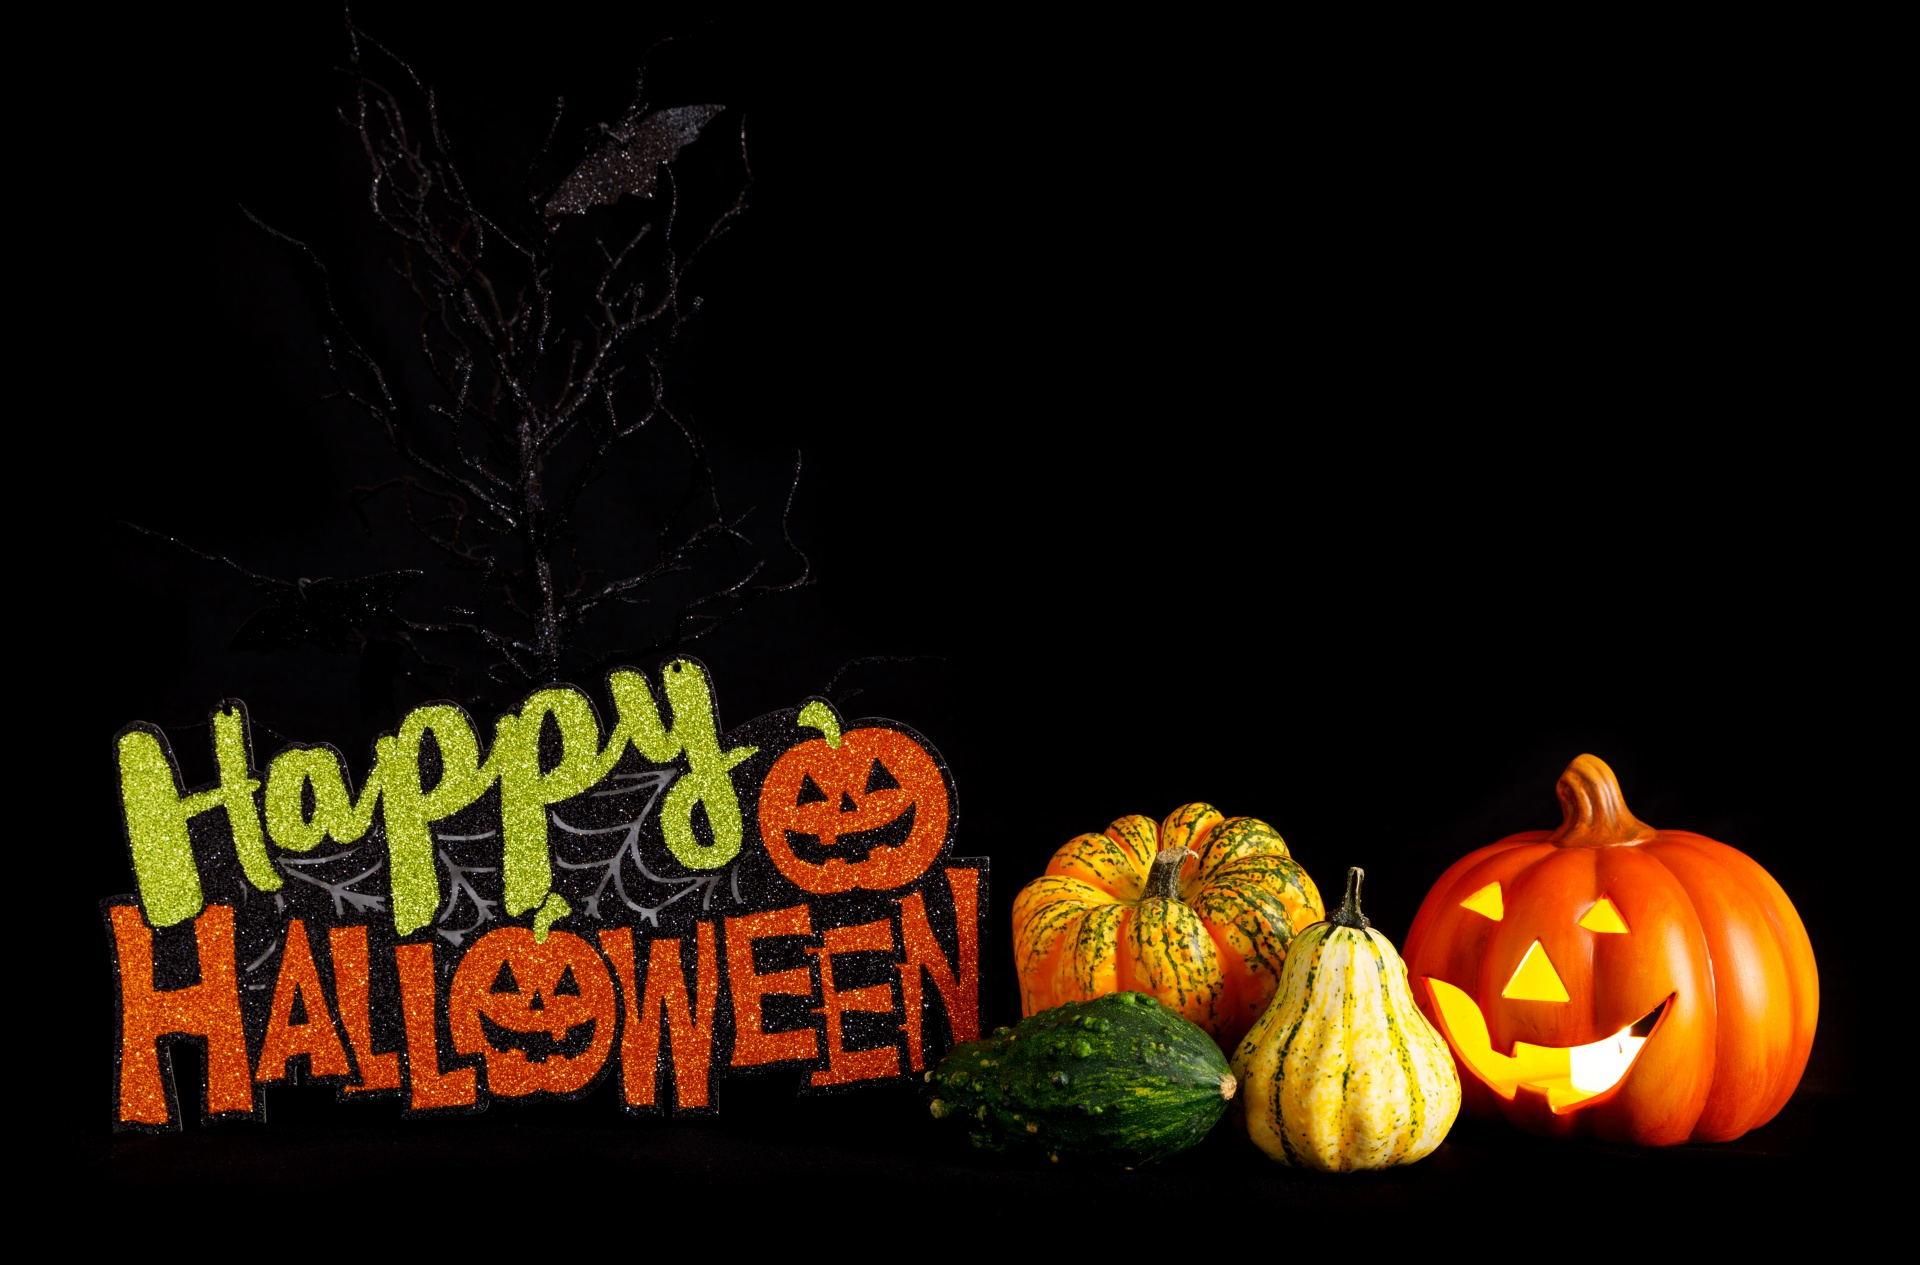 7 Happy Halloween Images to Post on Facebook, Twitter, Instagram ...